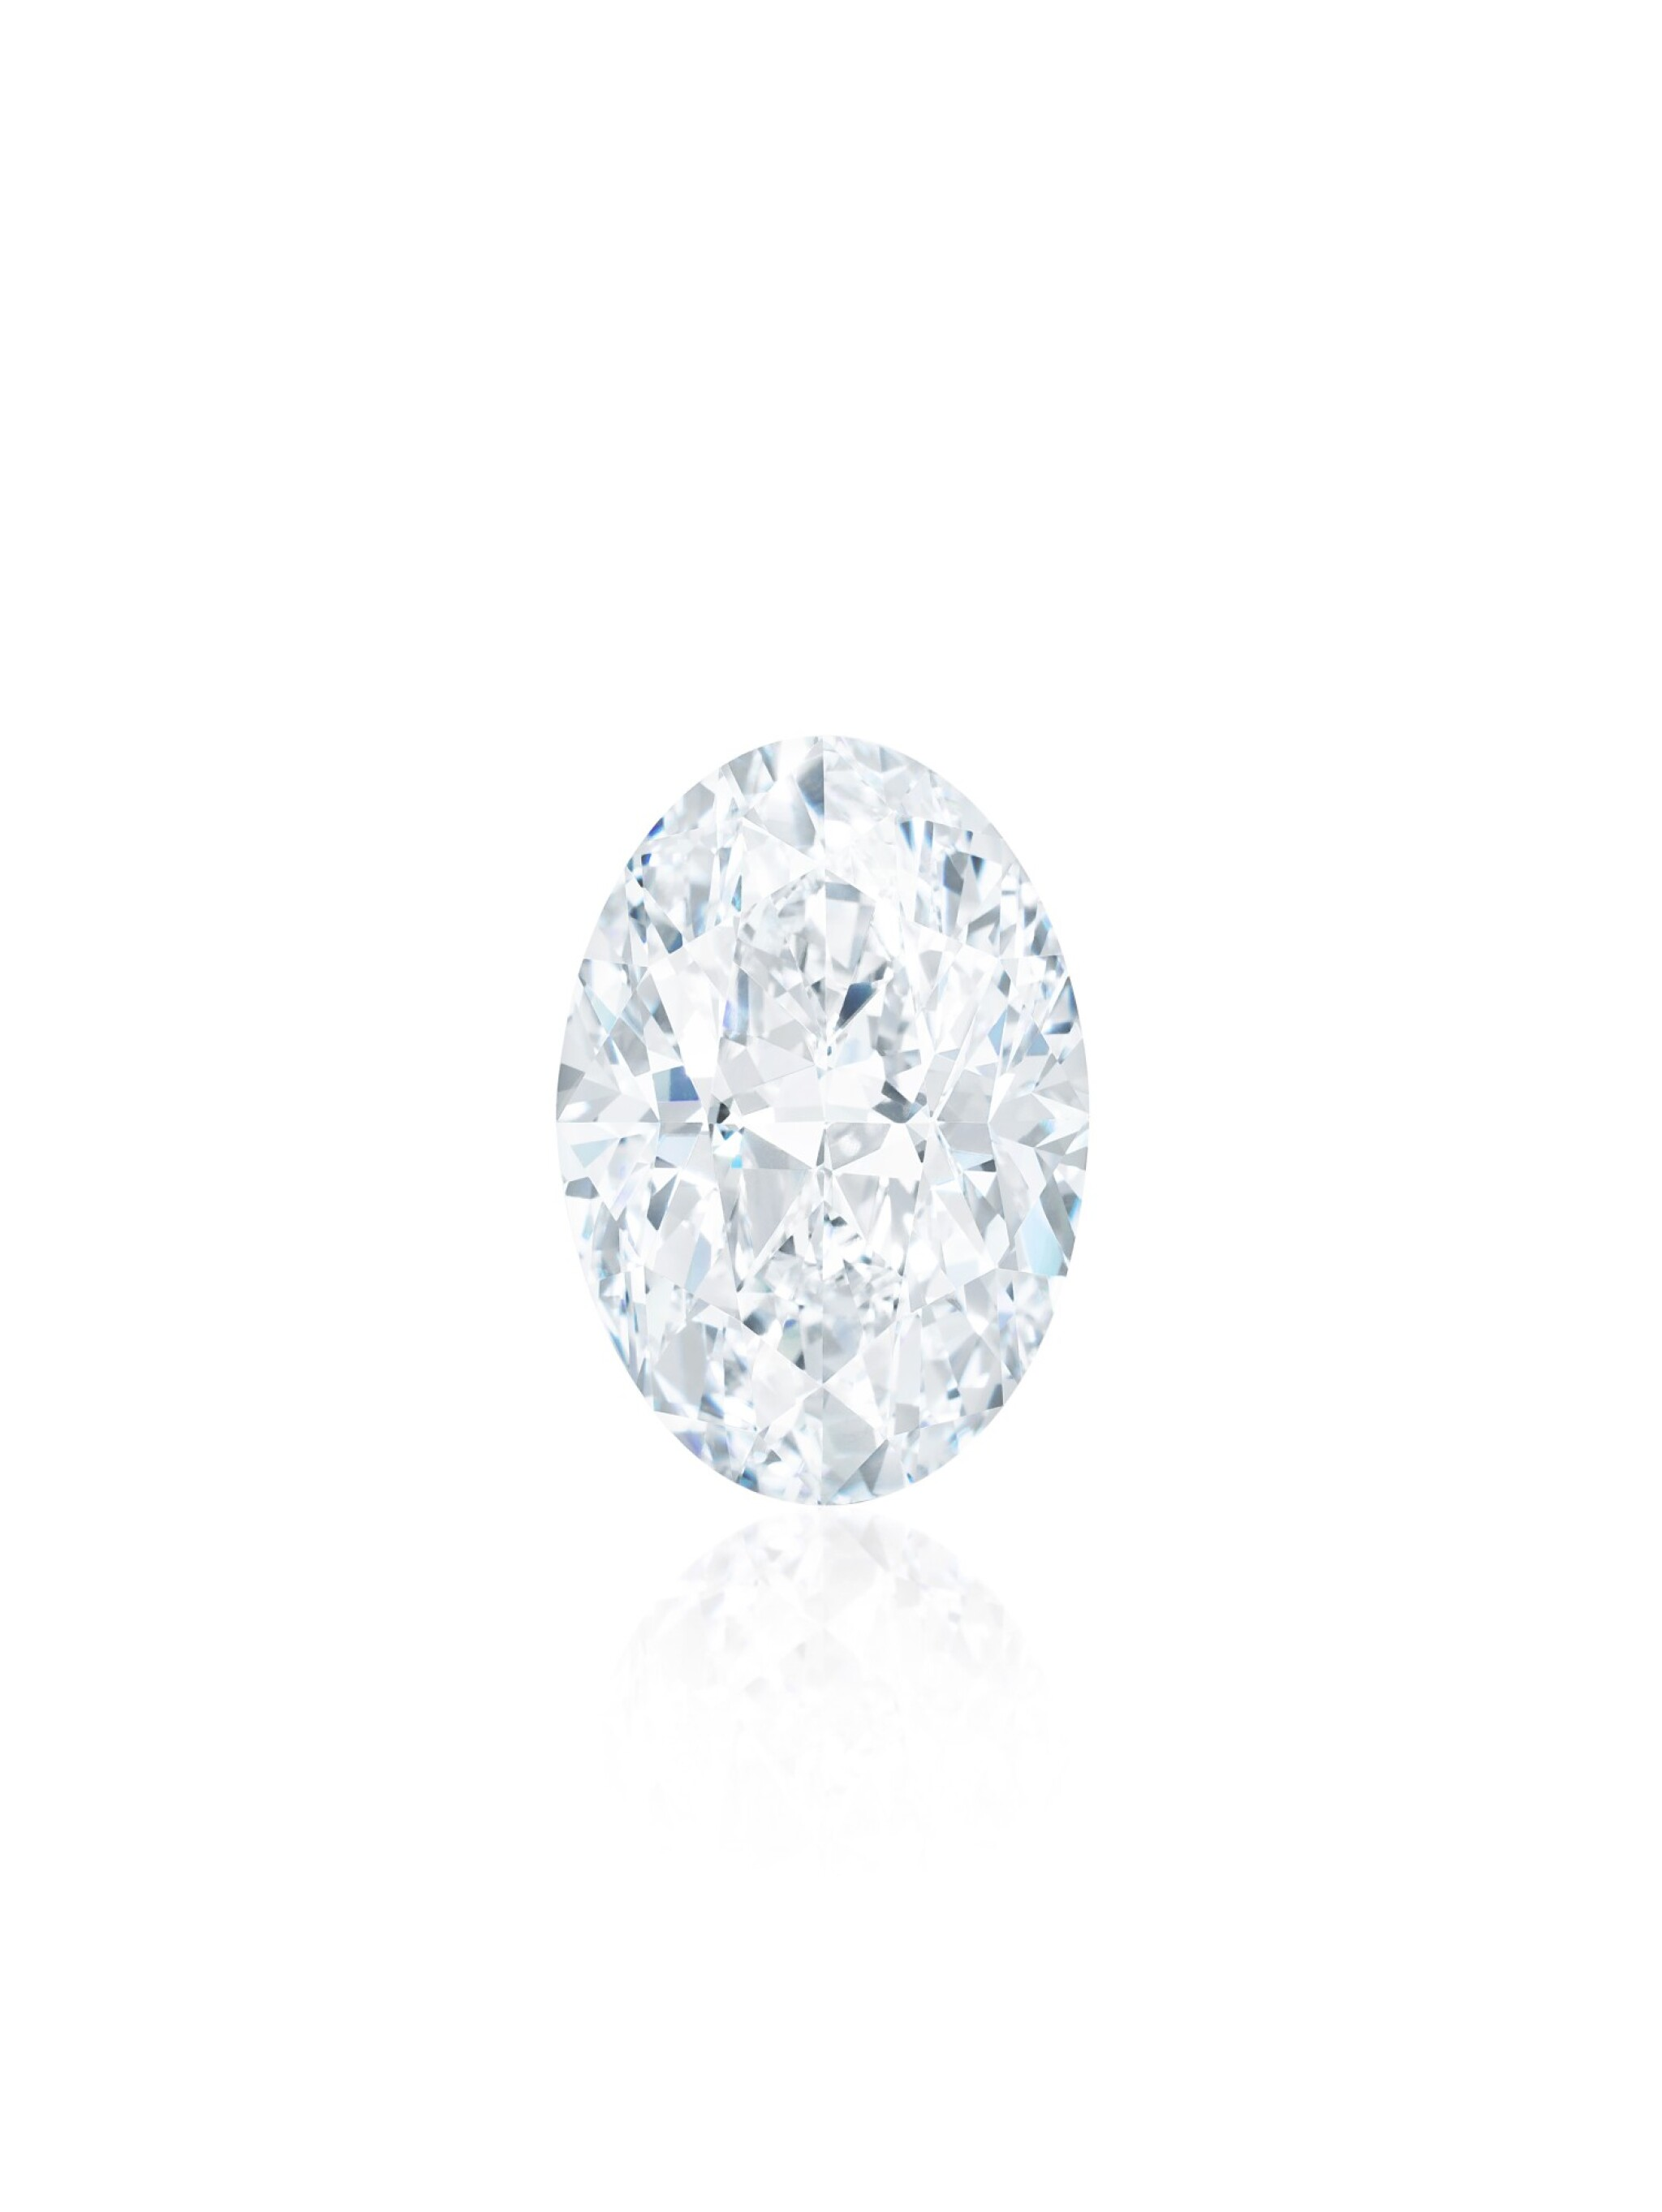 View full screen - View 1 of Lot 1818. A HIGHLY IMPORTANT UNMOUNTED DIAMOND | 102.39卡拉 橢圓形 D色 內外無瑕 Type IIa 全美鑽石.